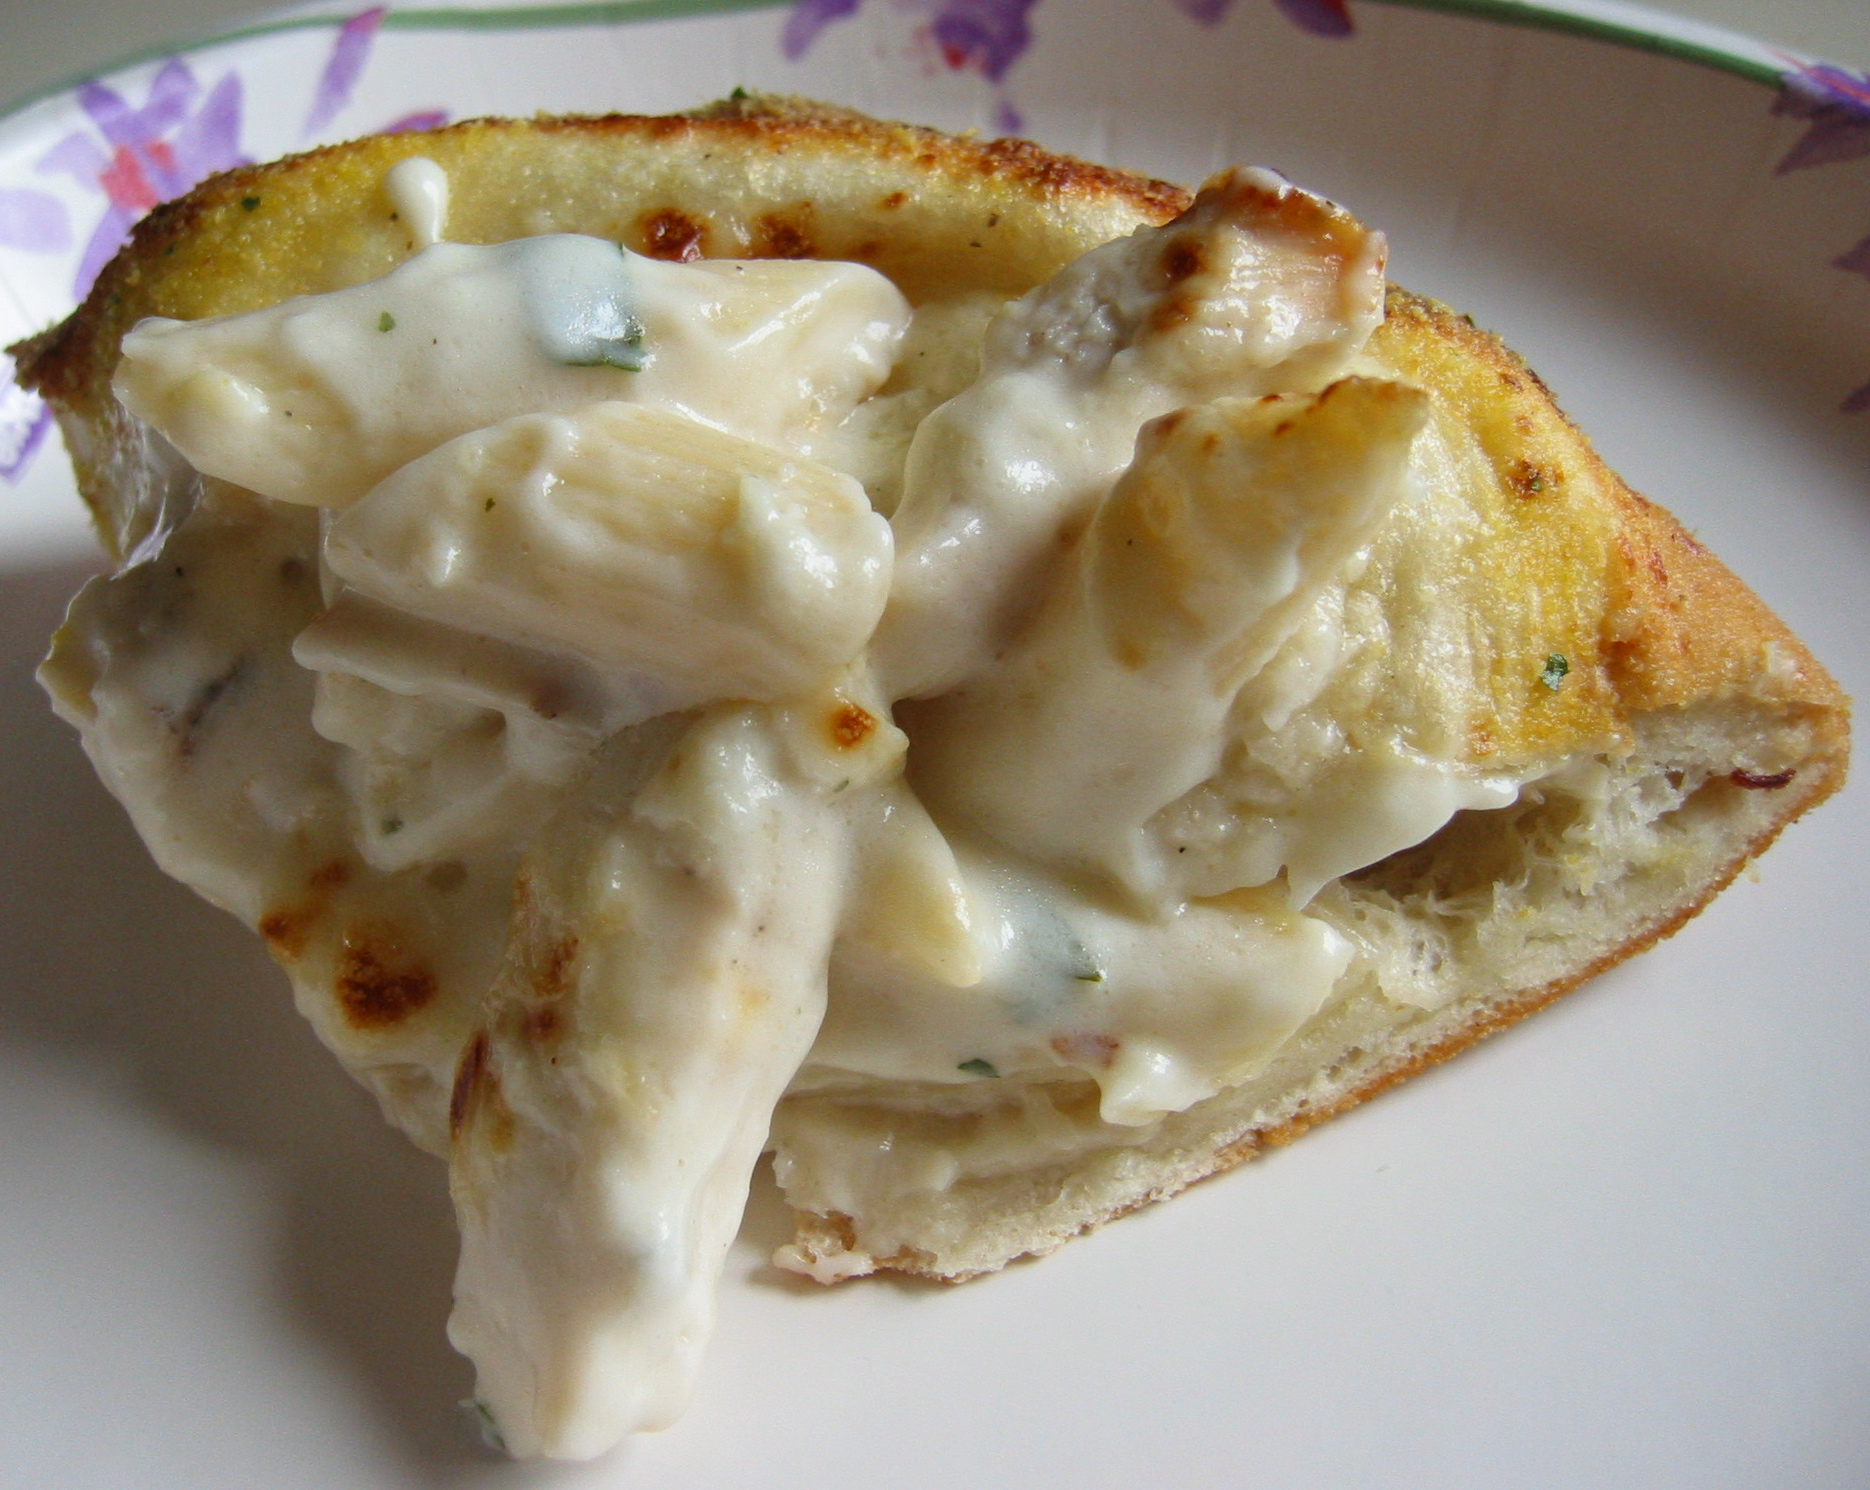 Domino's Bread Bowl Pastas